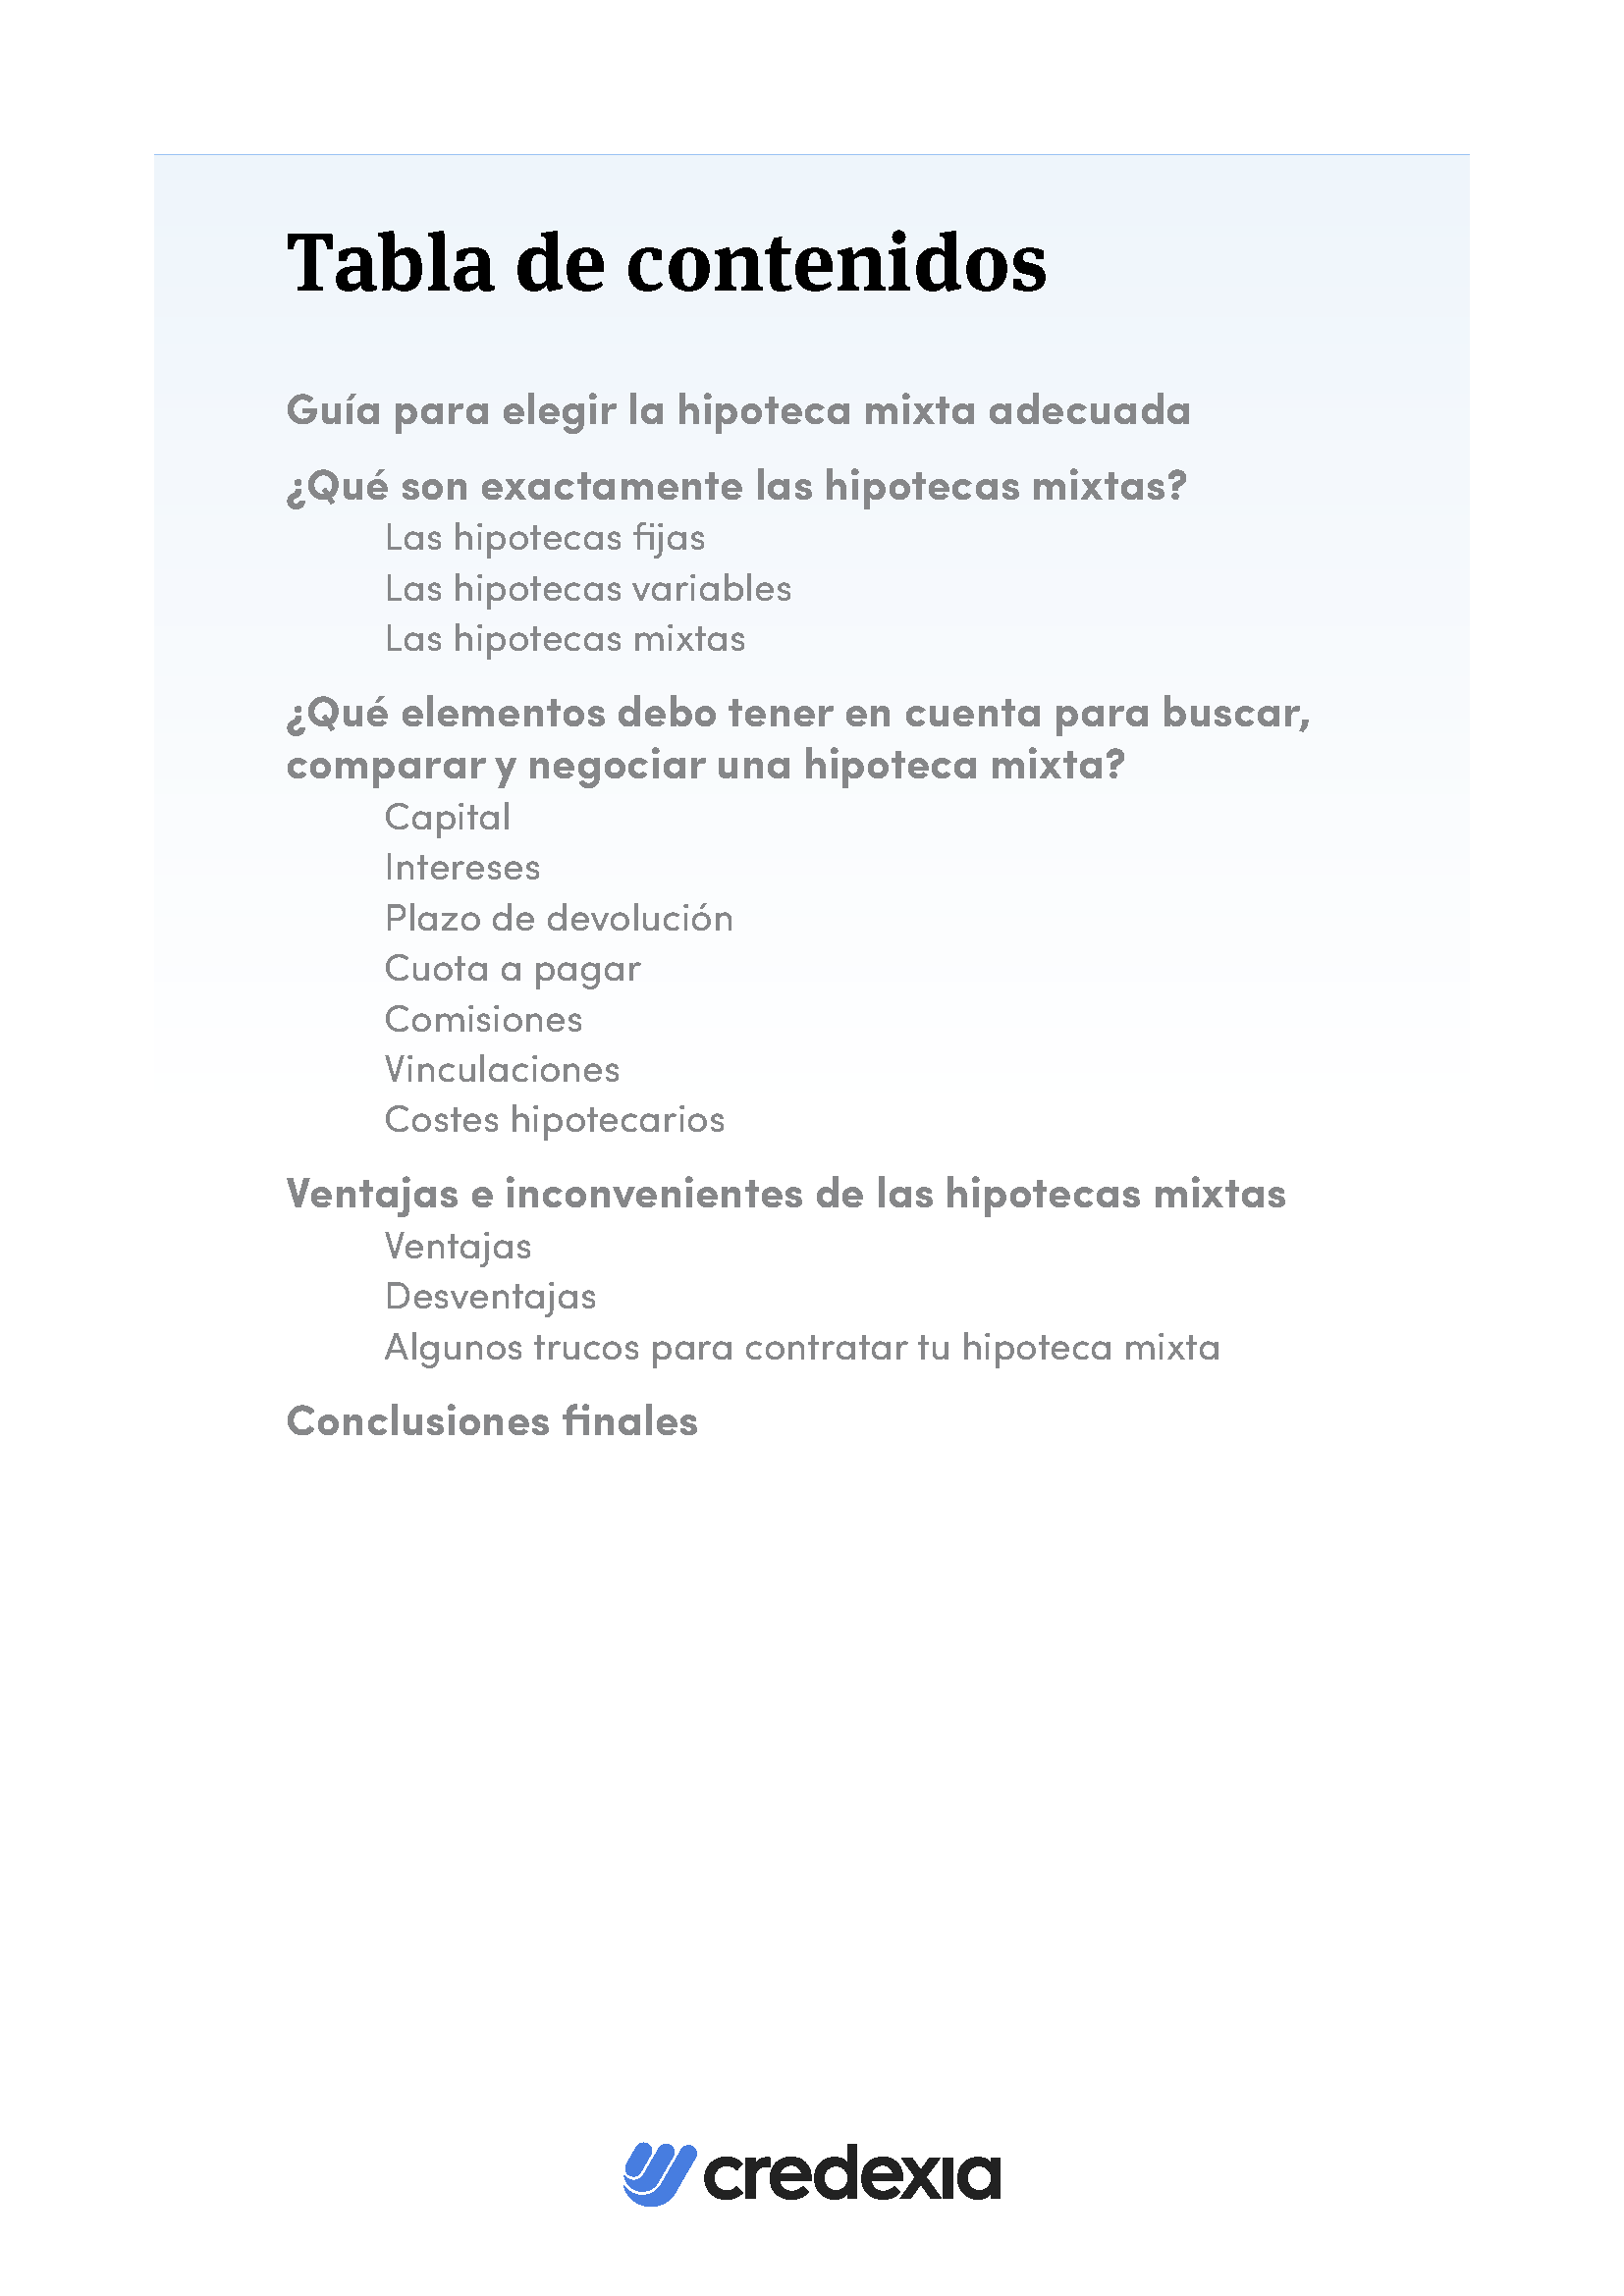 CRE - Hipotecas mixtas - Portada 2D_Página_02